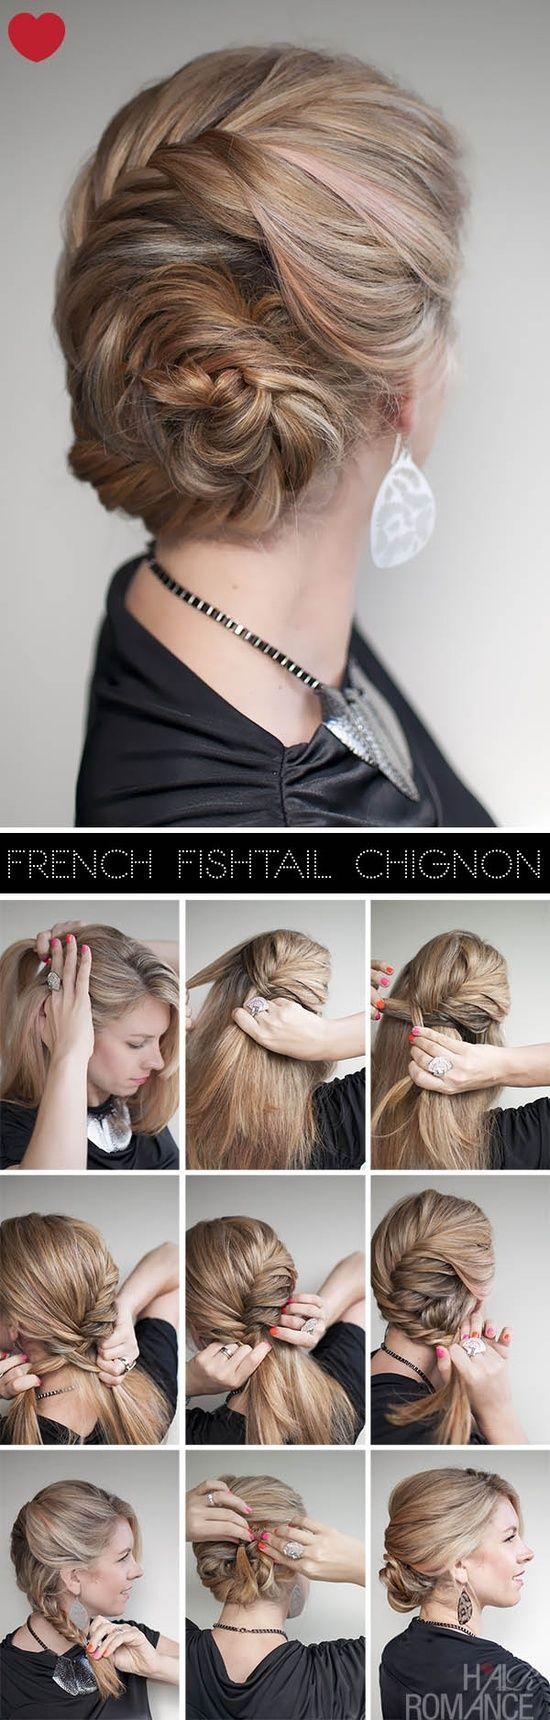 French Fishtail Braid